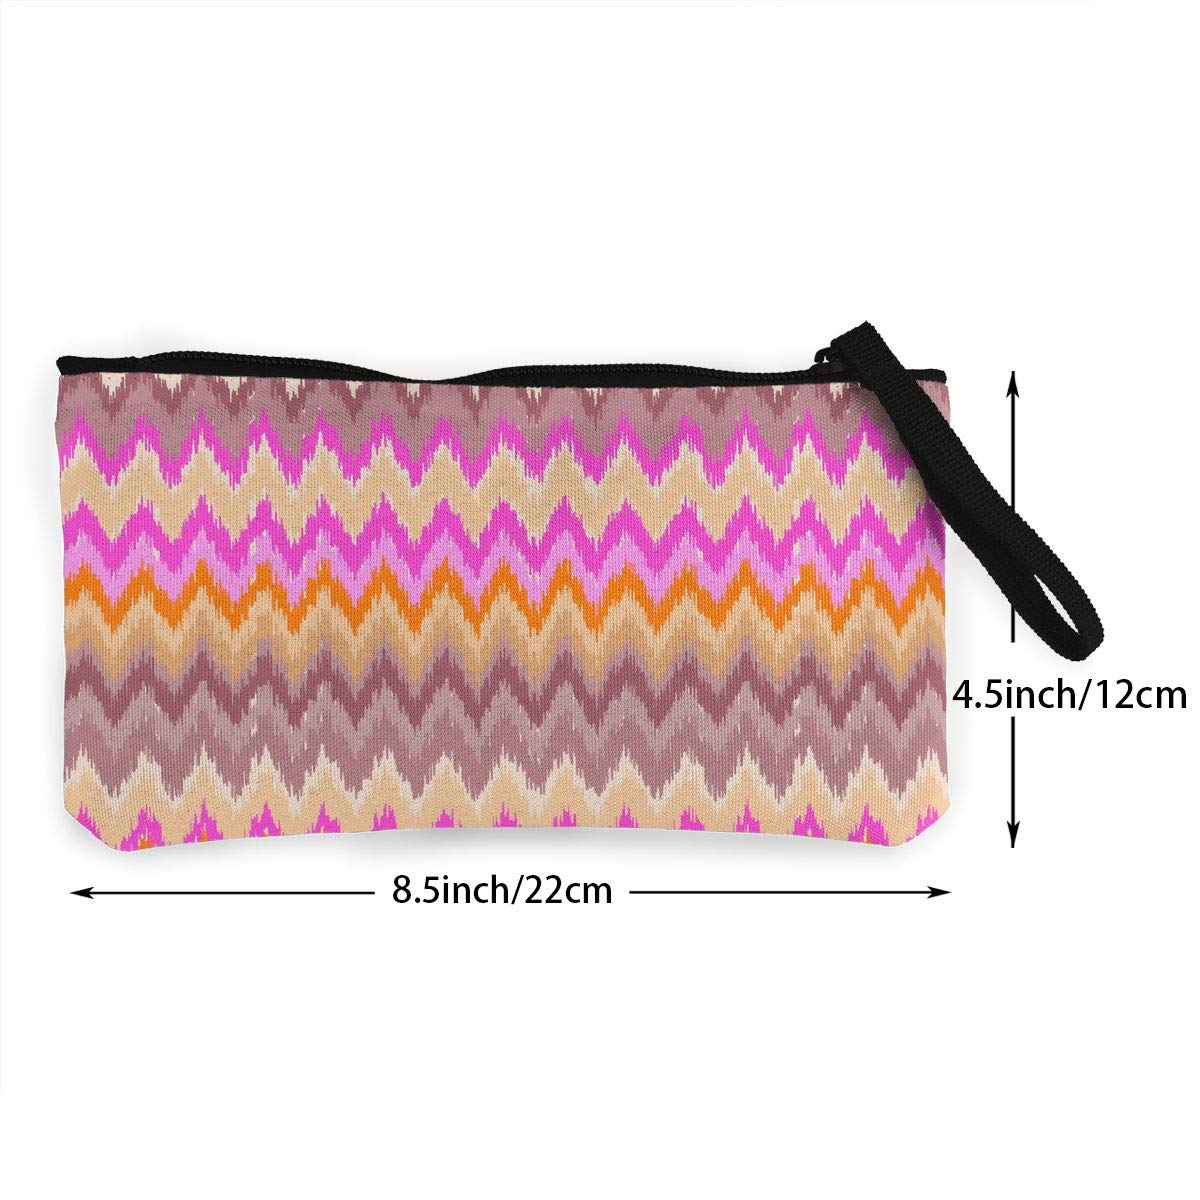 Womens Canvas Coin Purse Cellphone Clutch Purse With Wrist Strap Ripple Pink Orange Pattern Zipper Small Purse Wallets